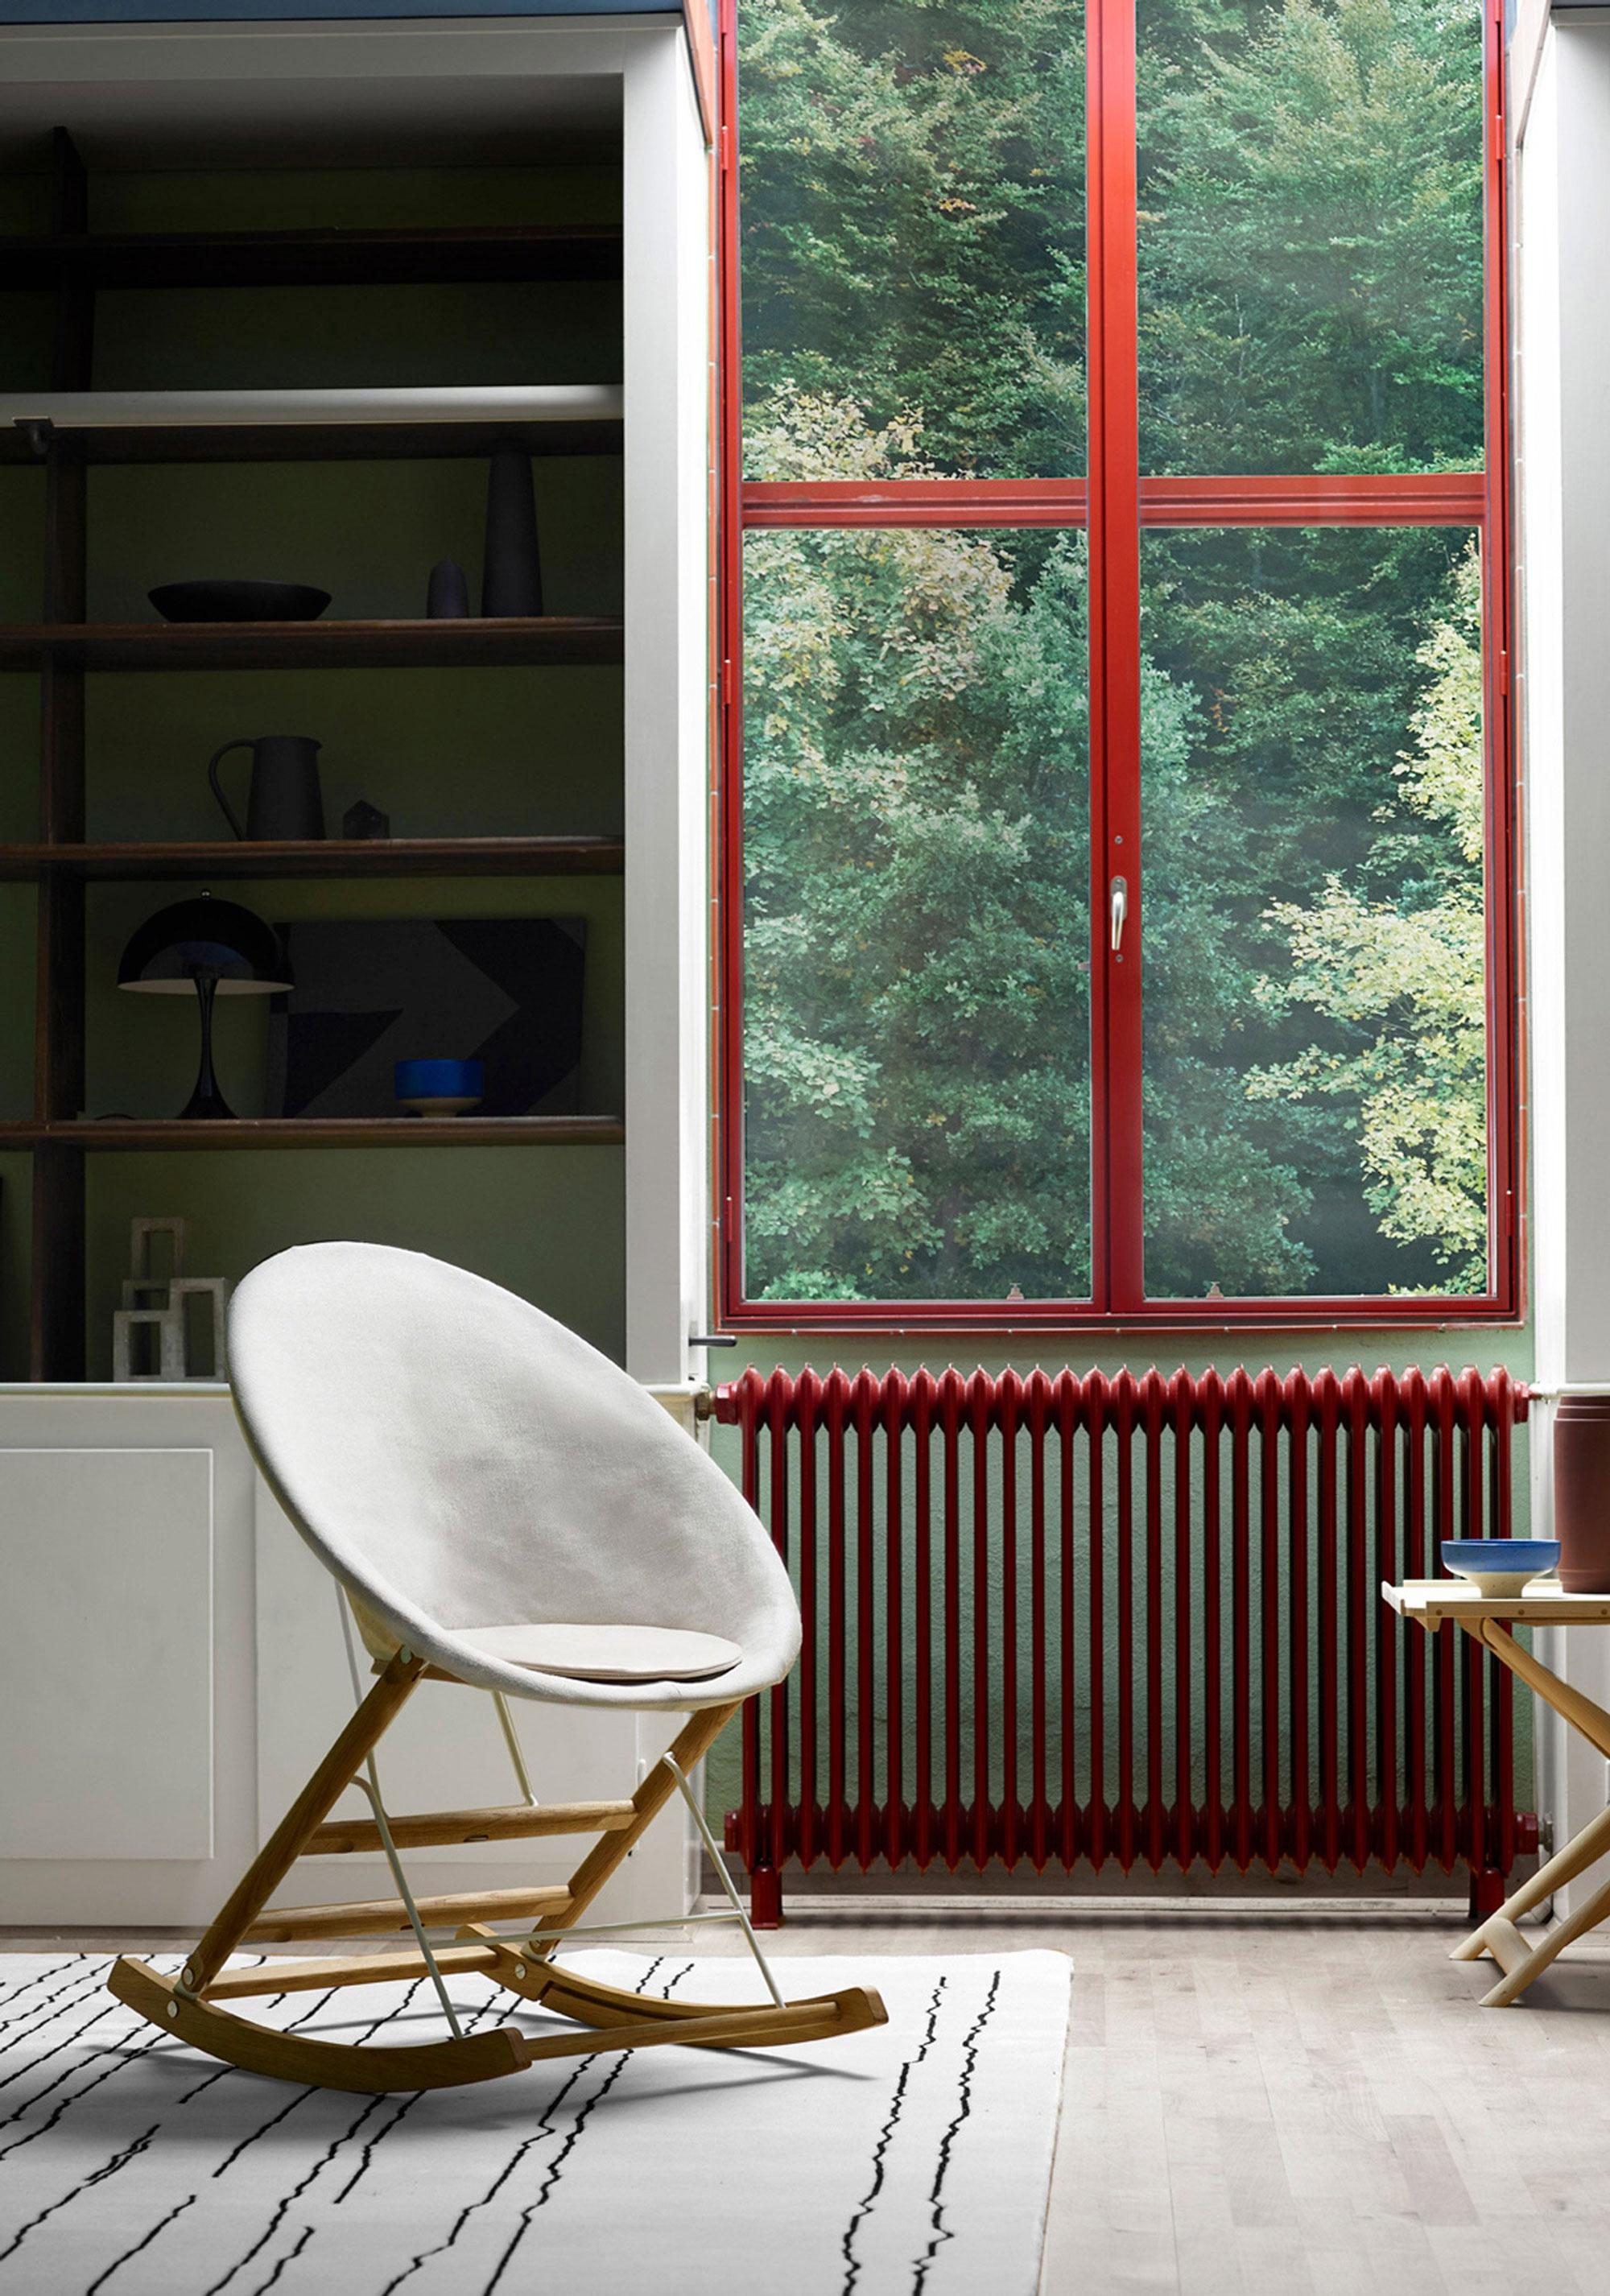 rocking-chair-anker-bak-carl-hansen-gessato-2